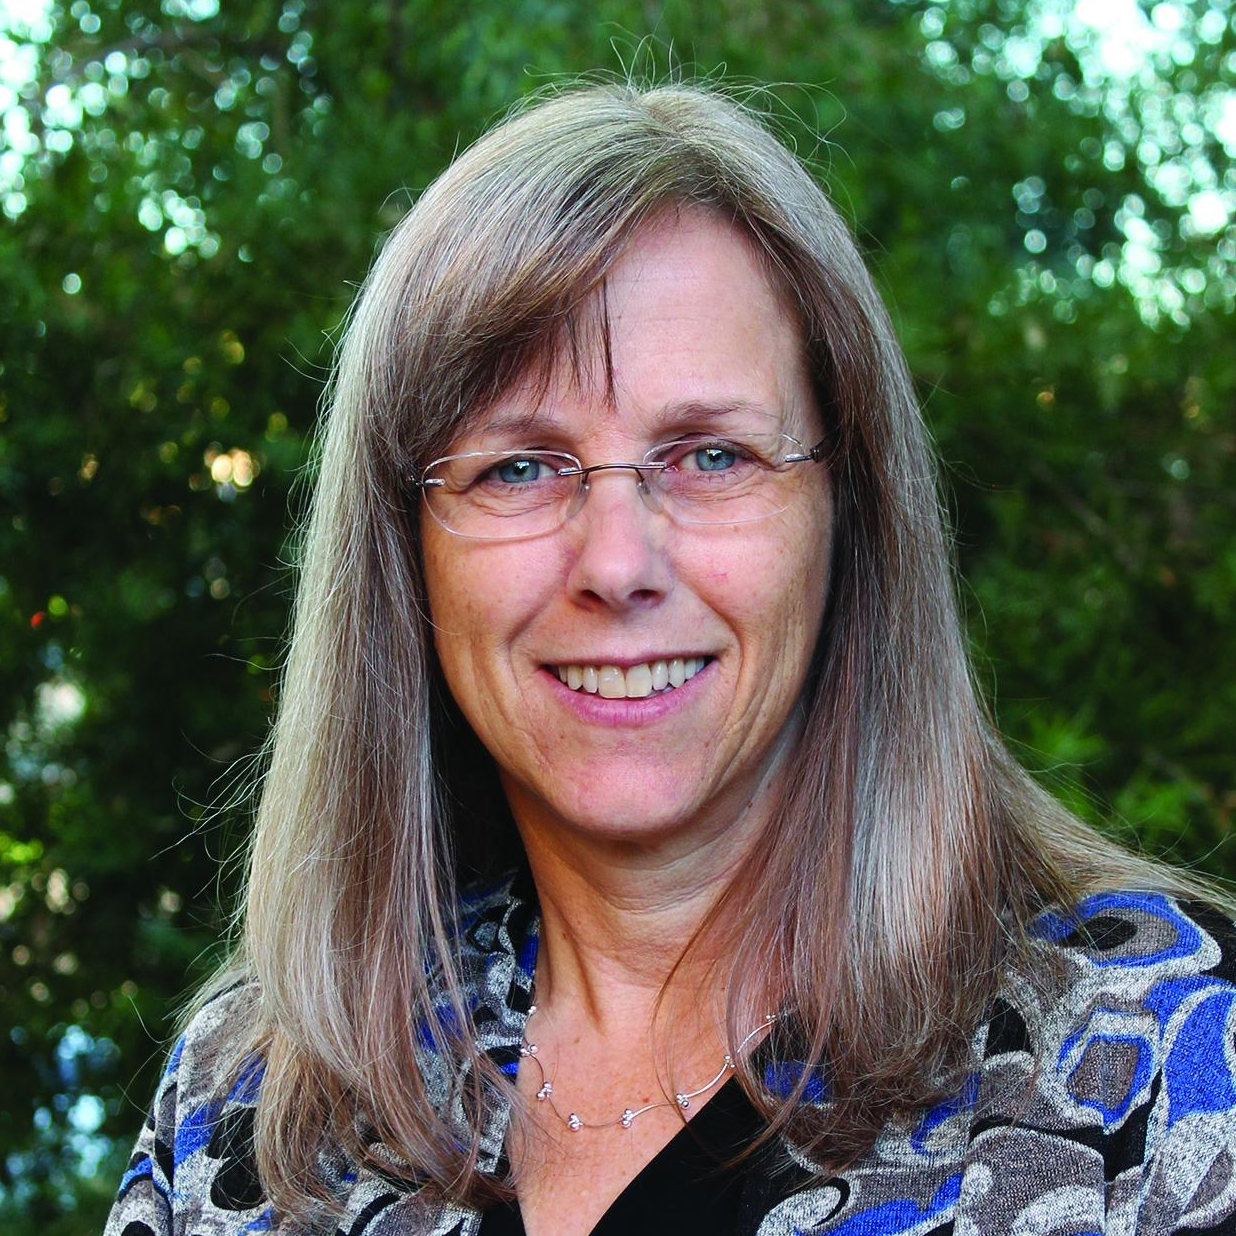 President/CEO Denise Ensdorff